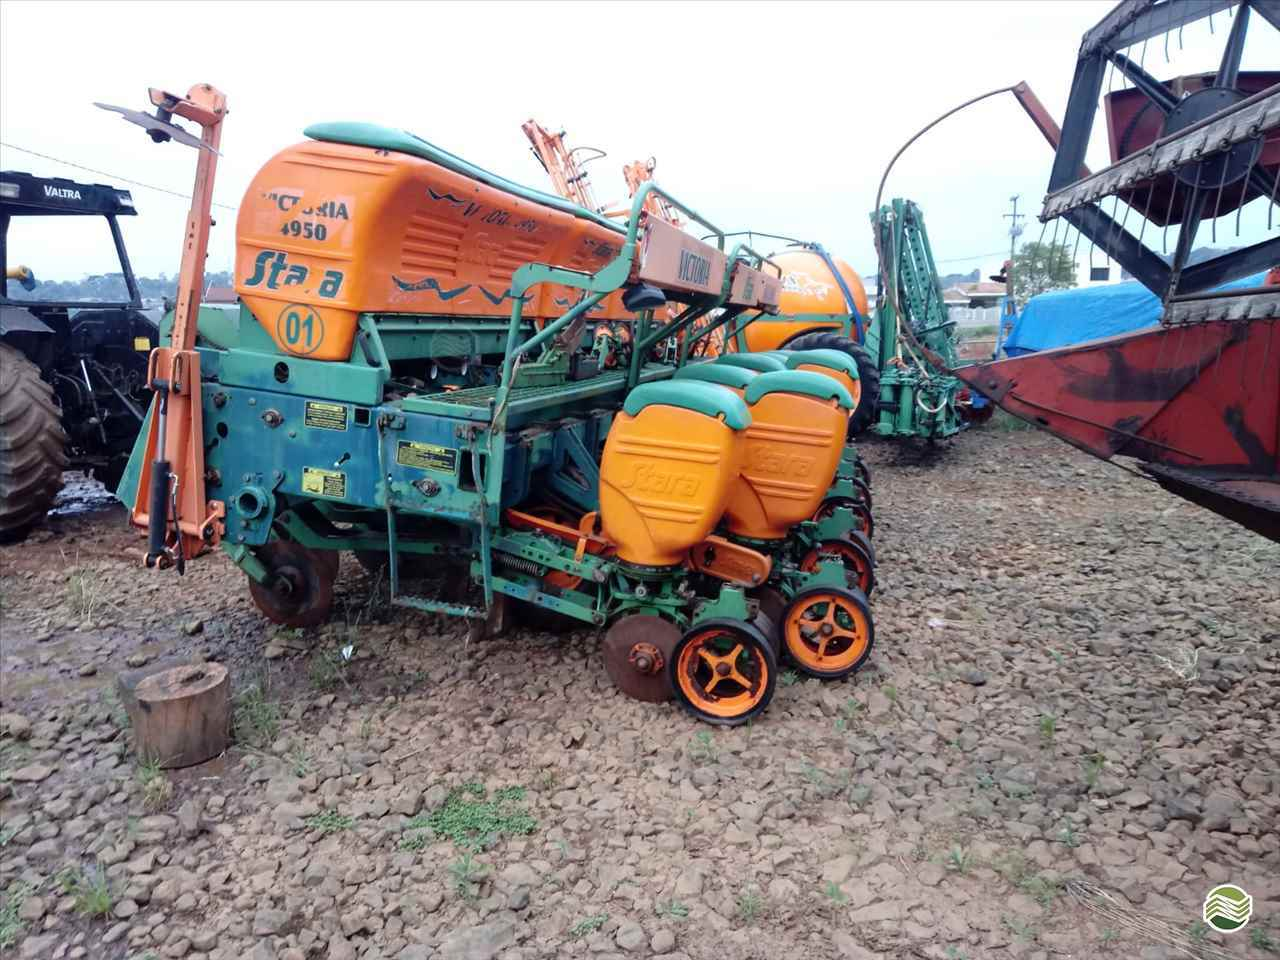 FÊNIX 3000 de Verenka Implementos Agrícolas  - TURVO/PR